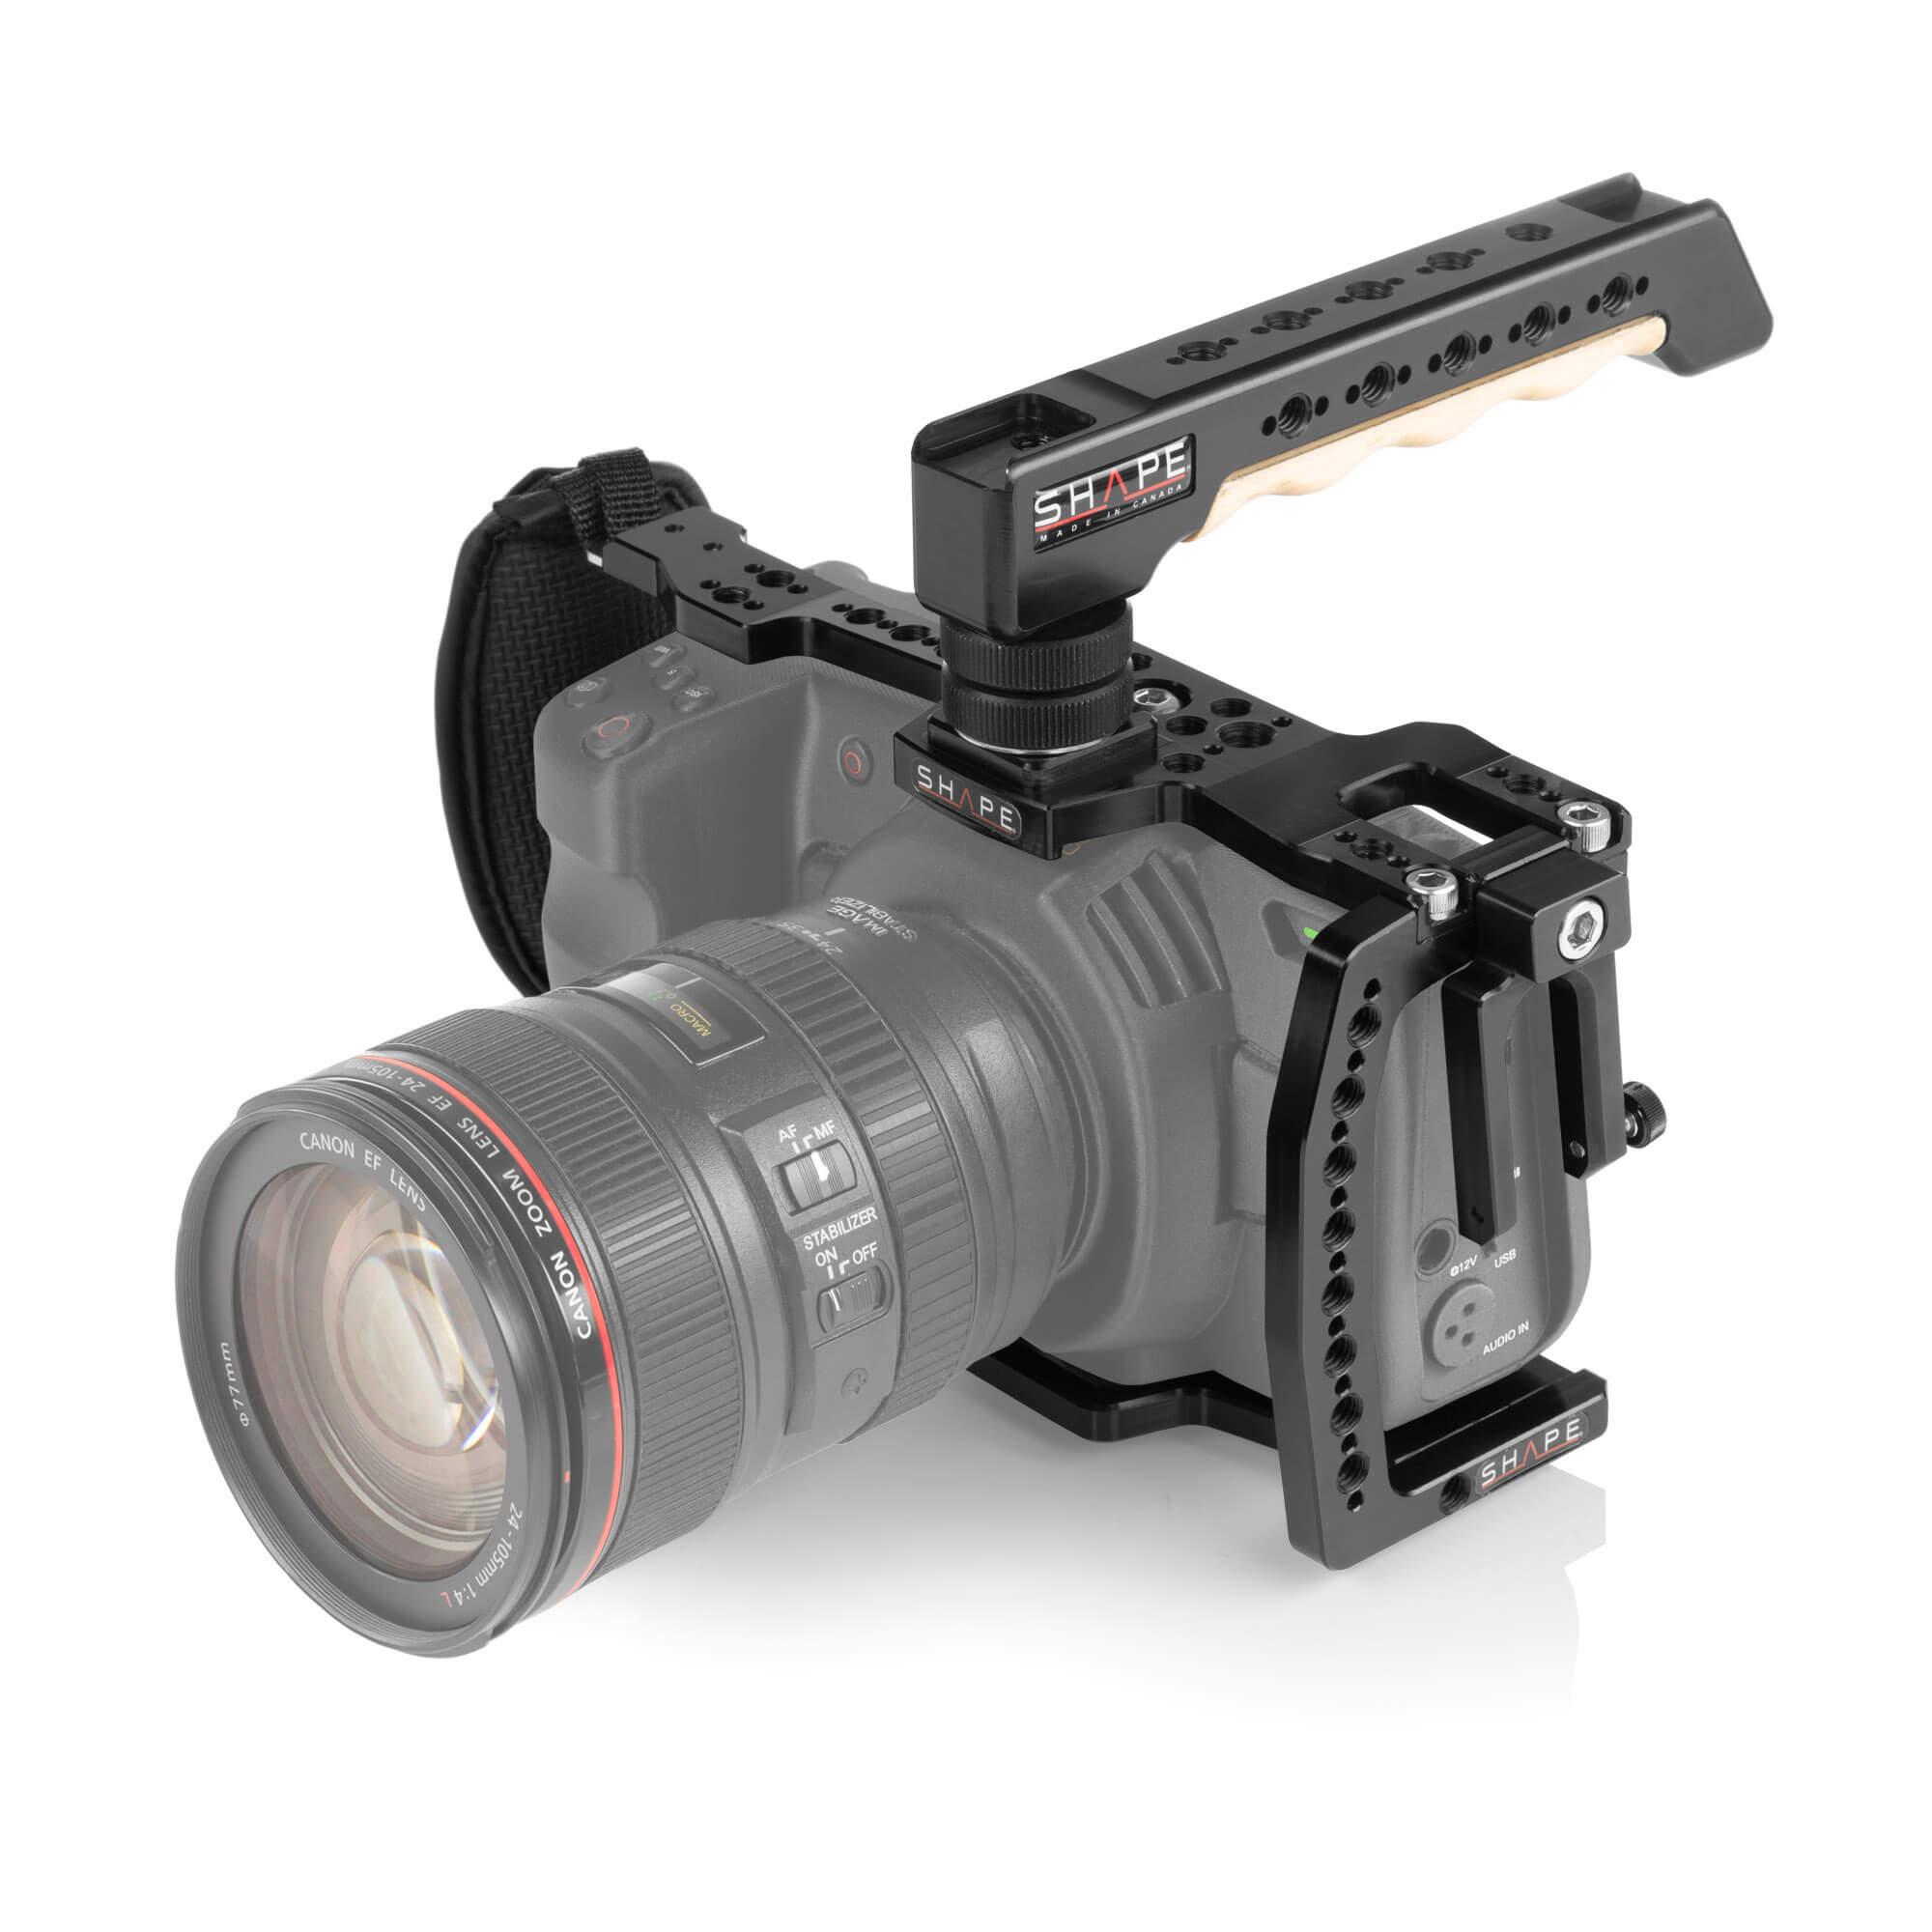 Shape Cage For Blackmagic Pocket Cinema Camera 4k 6k With Top Handle Shape